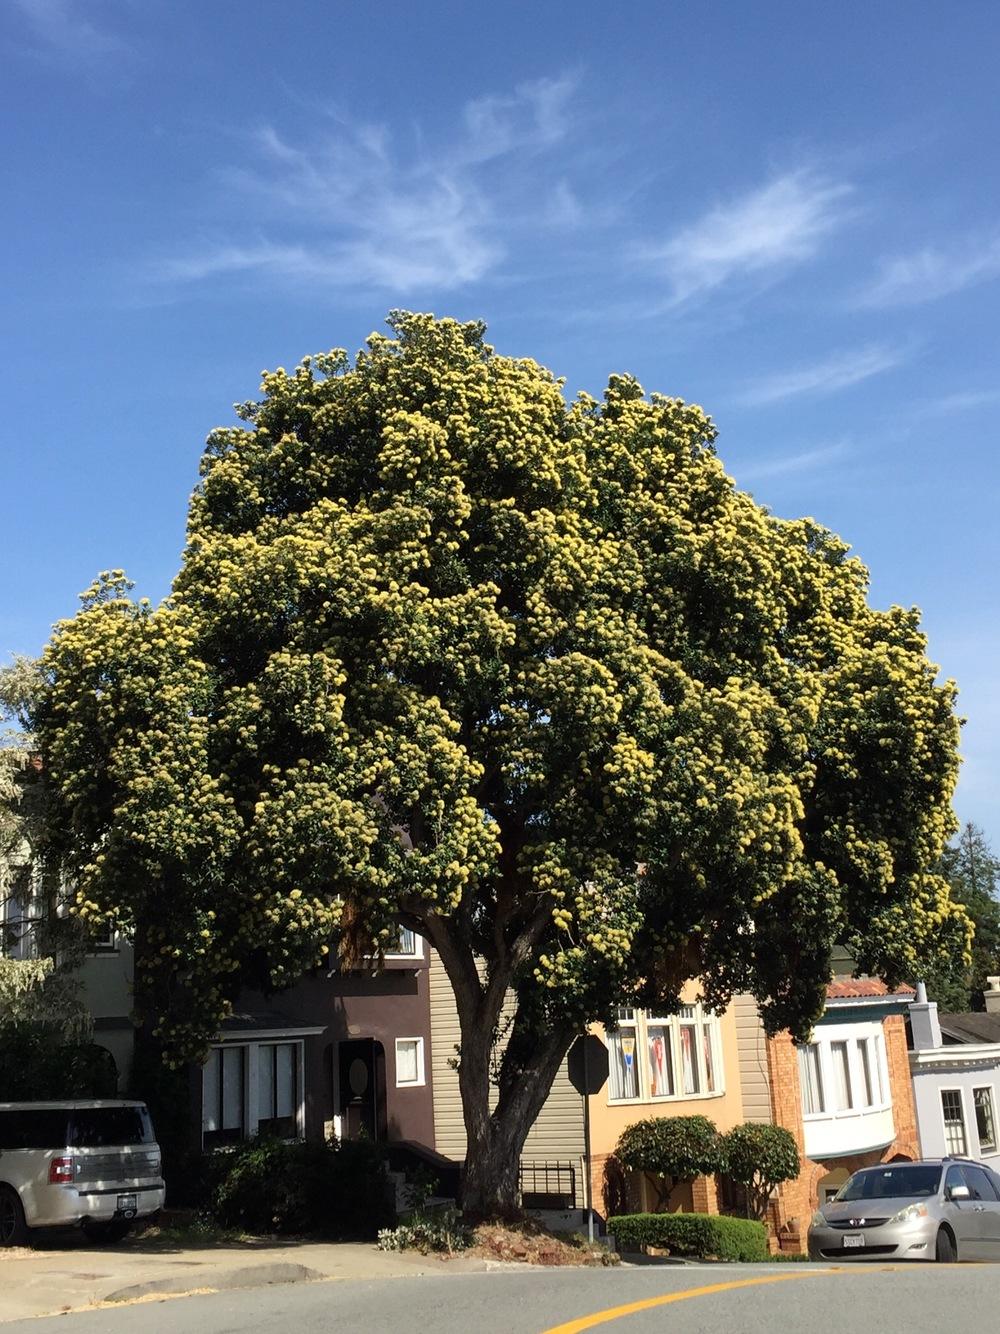 Yellow New Zealand Christmas Tree - 1221 Stanyan Street